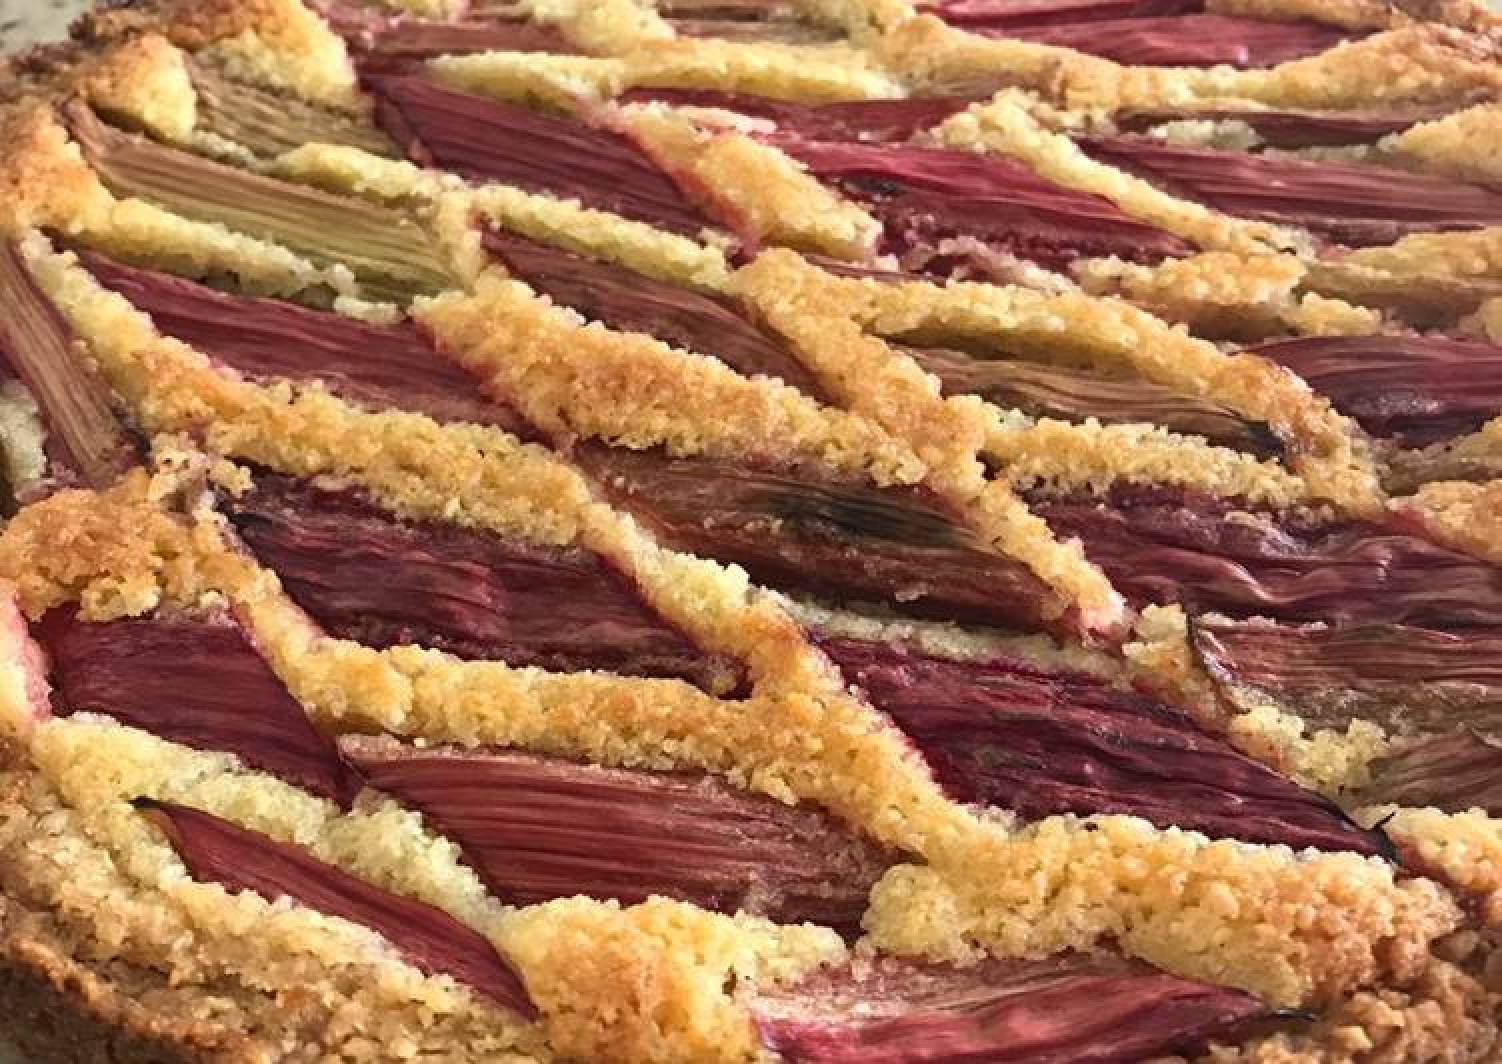 Rhubarb oats tart with frangipane